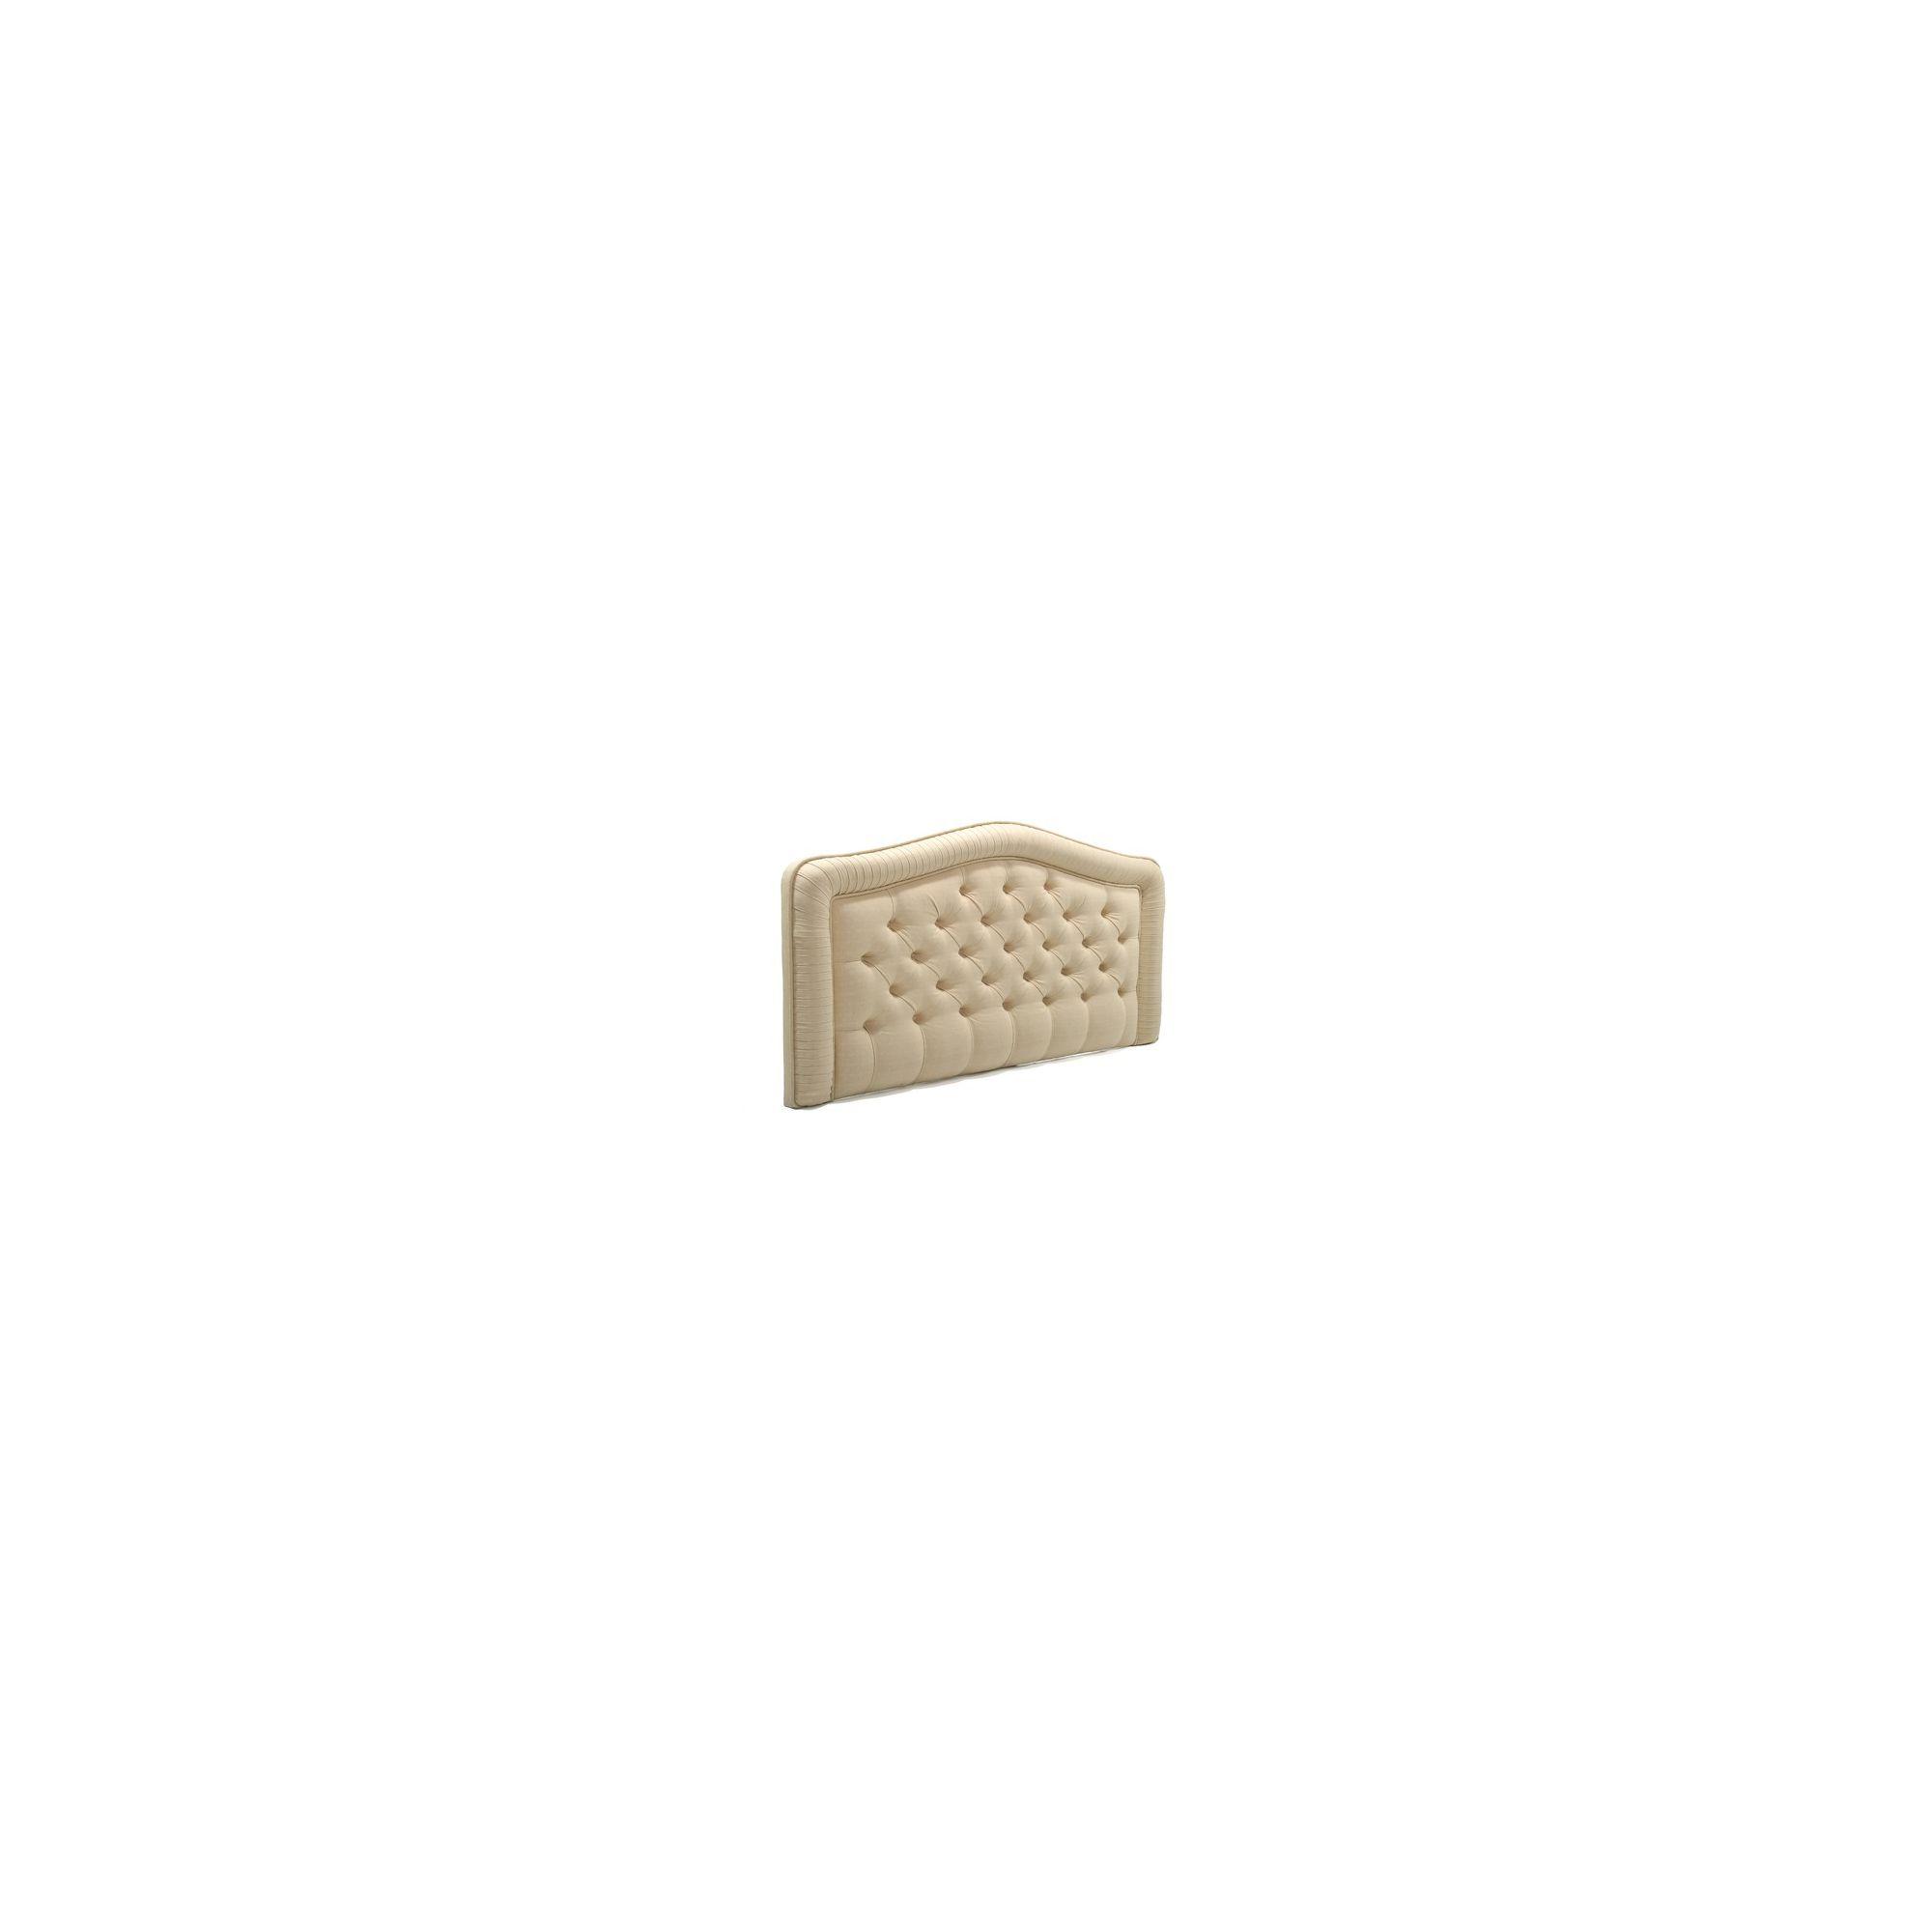 PC Upholstery Helsinki Headboard - Ecru - 3' Single at Tesco Direct